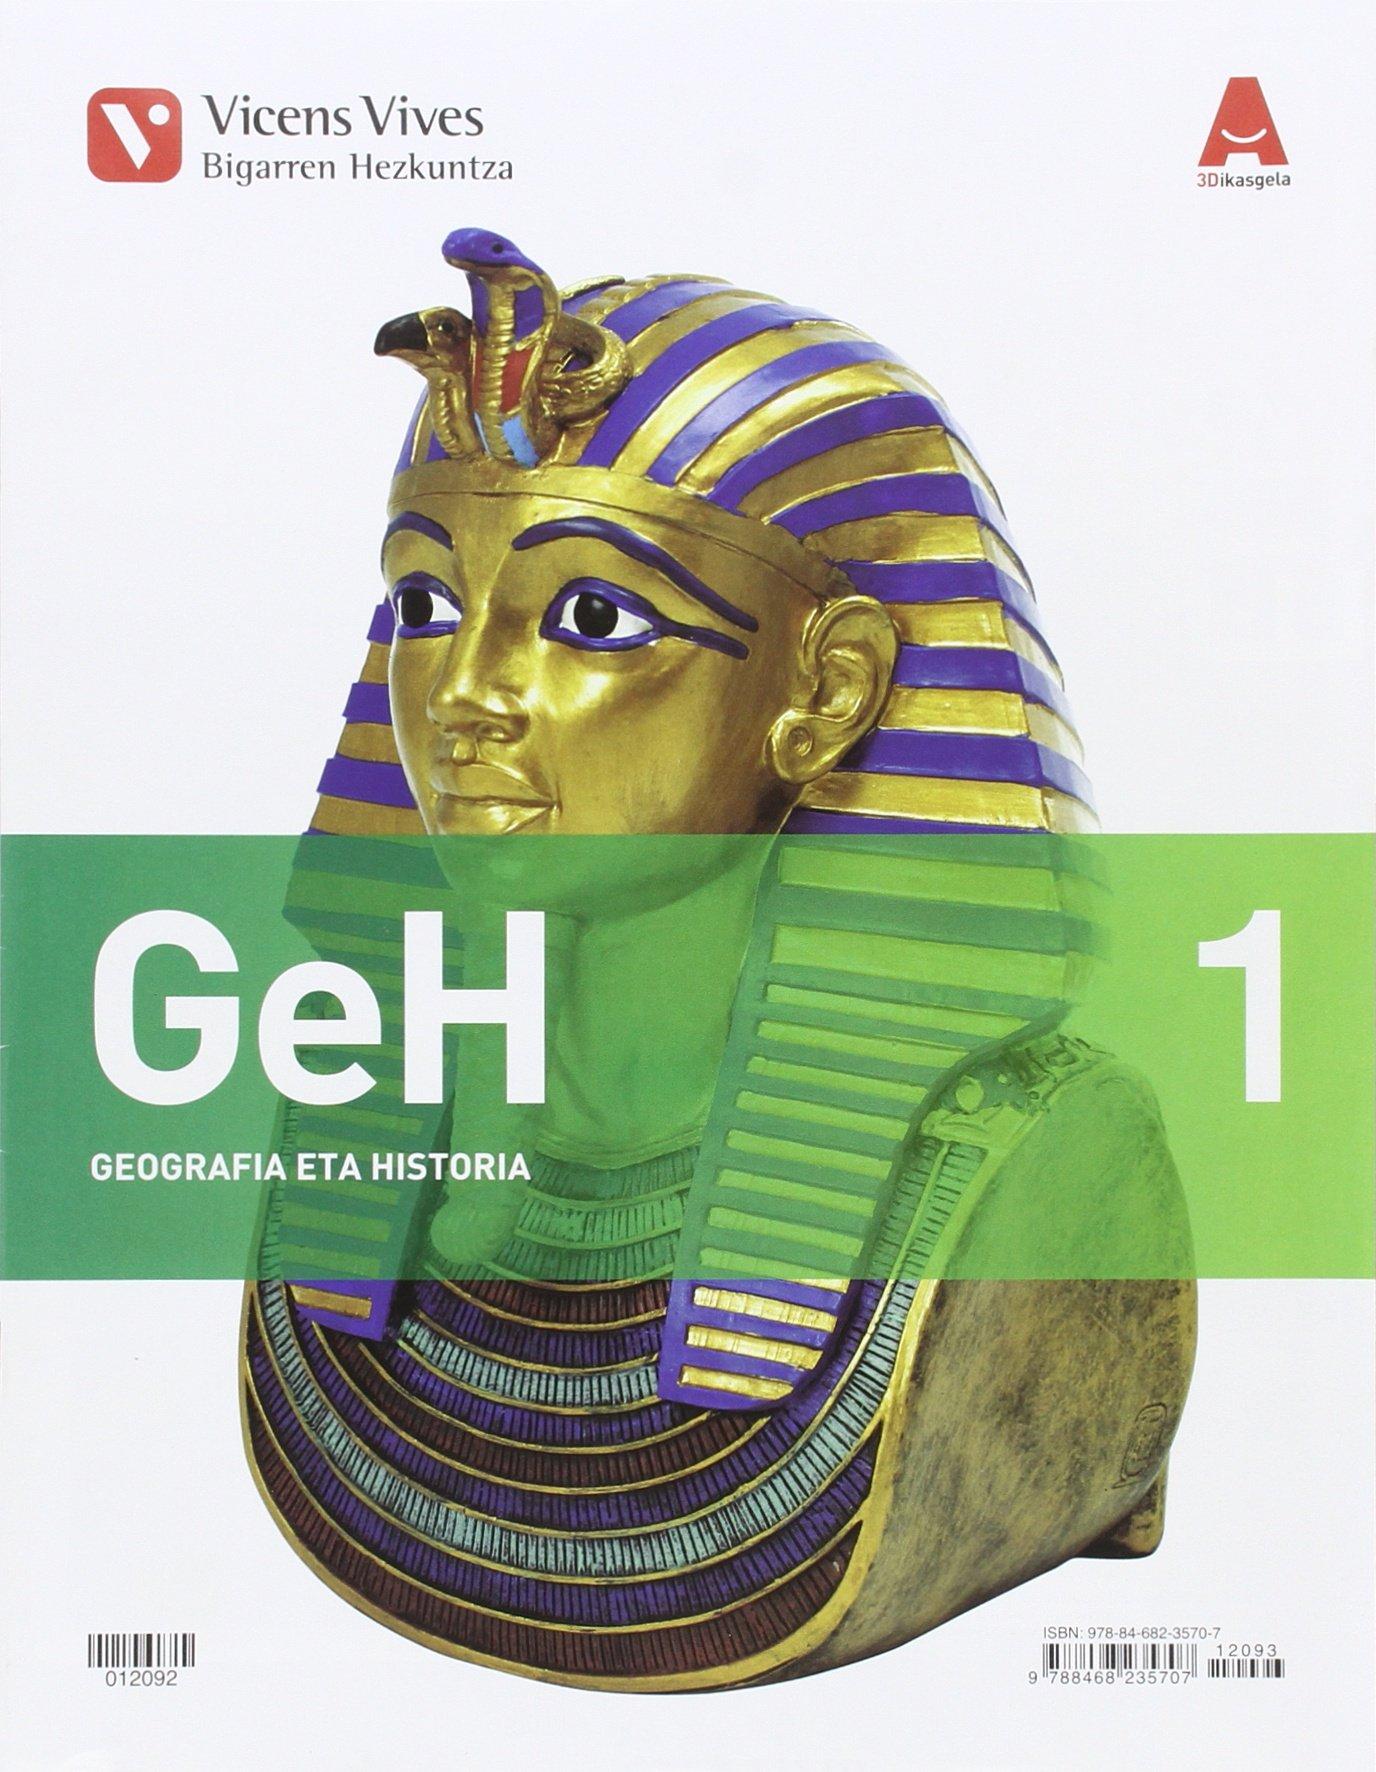 GEH 1 (1.1-1.2)+ SEPARATA PAIS VASCO 3D IKASGELA pdf